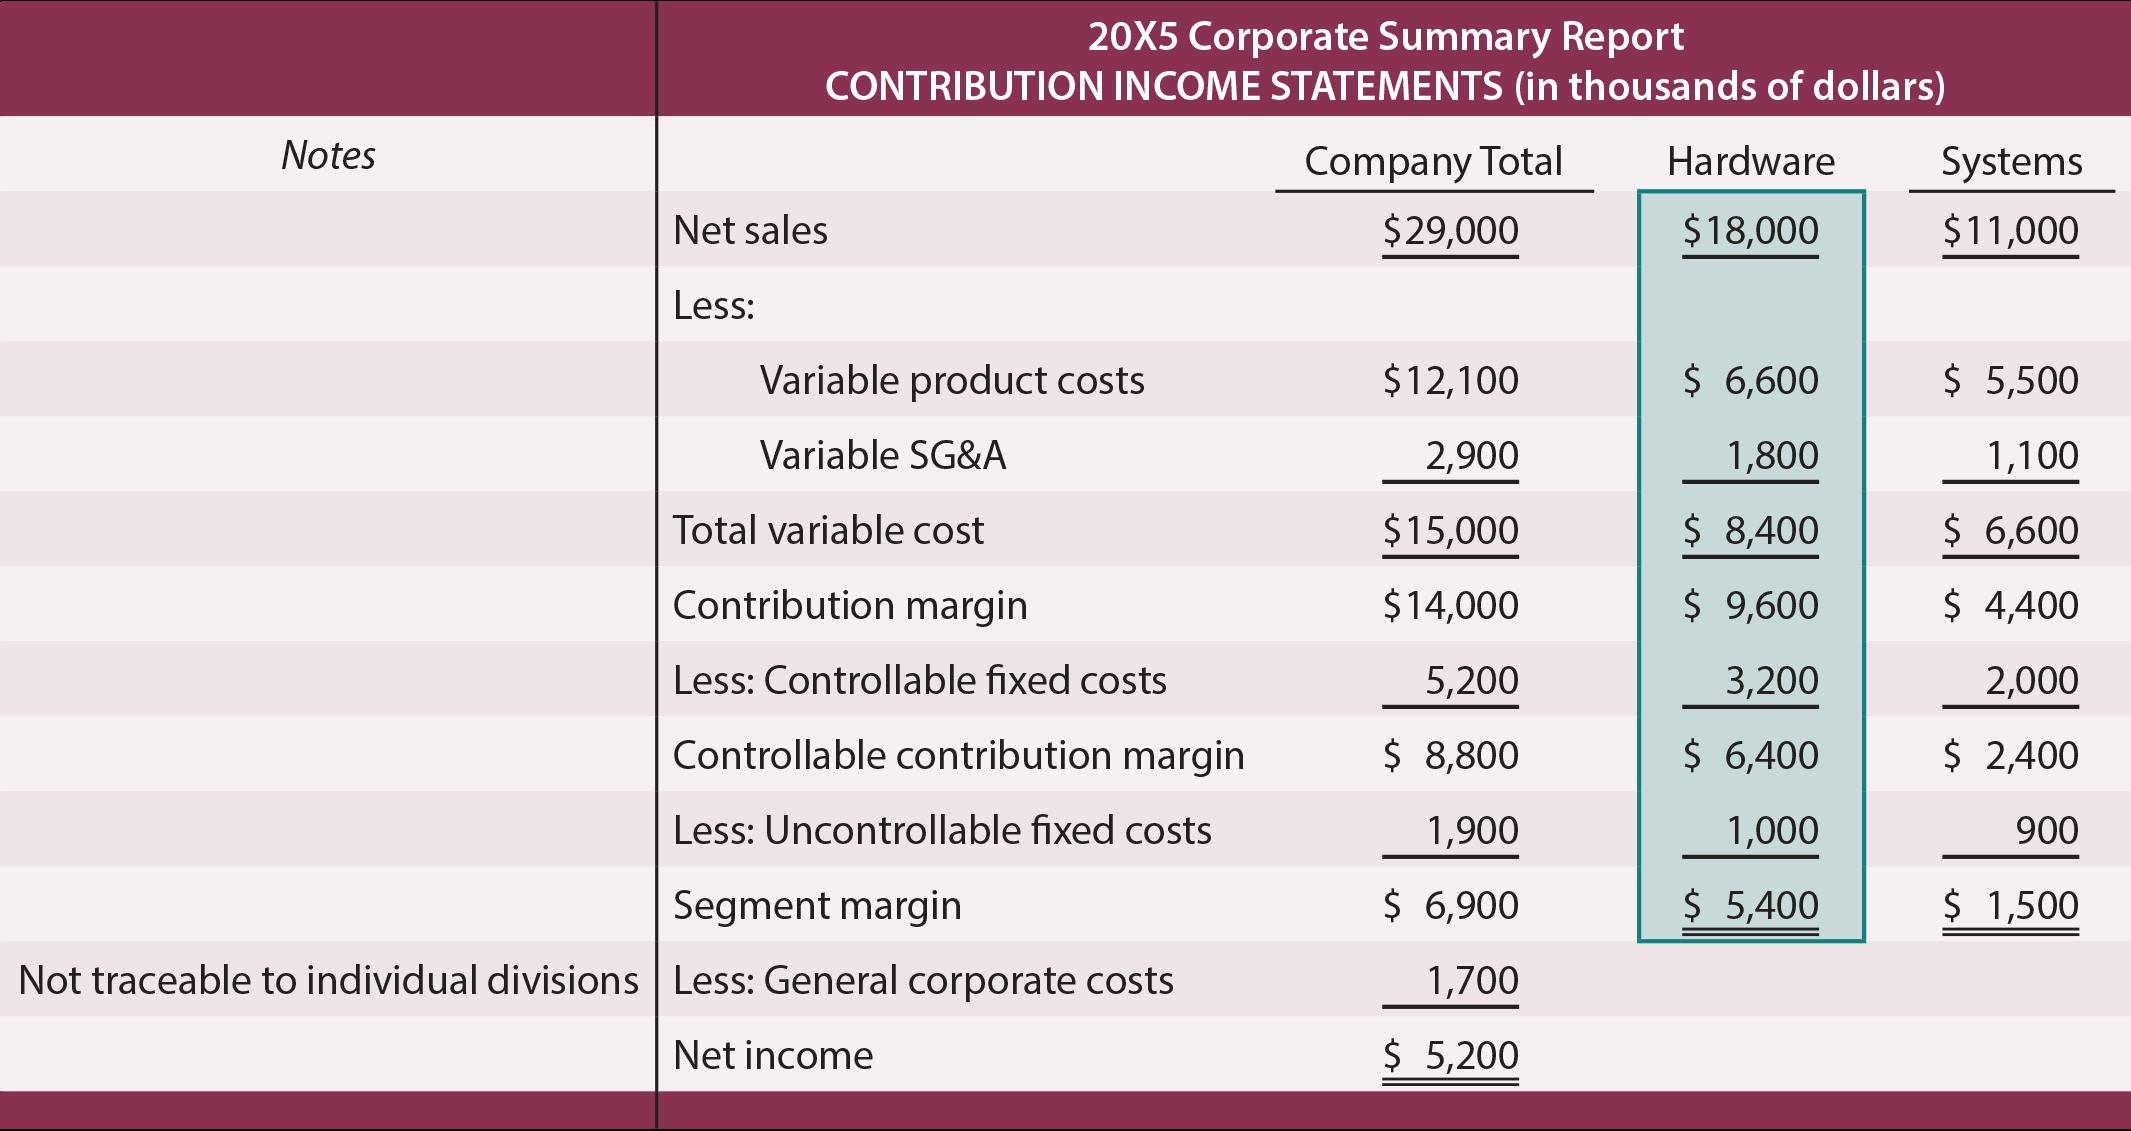 Corporate Summary Report